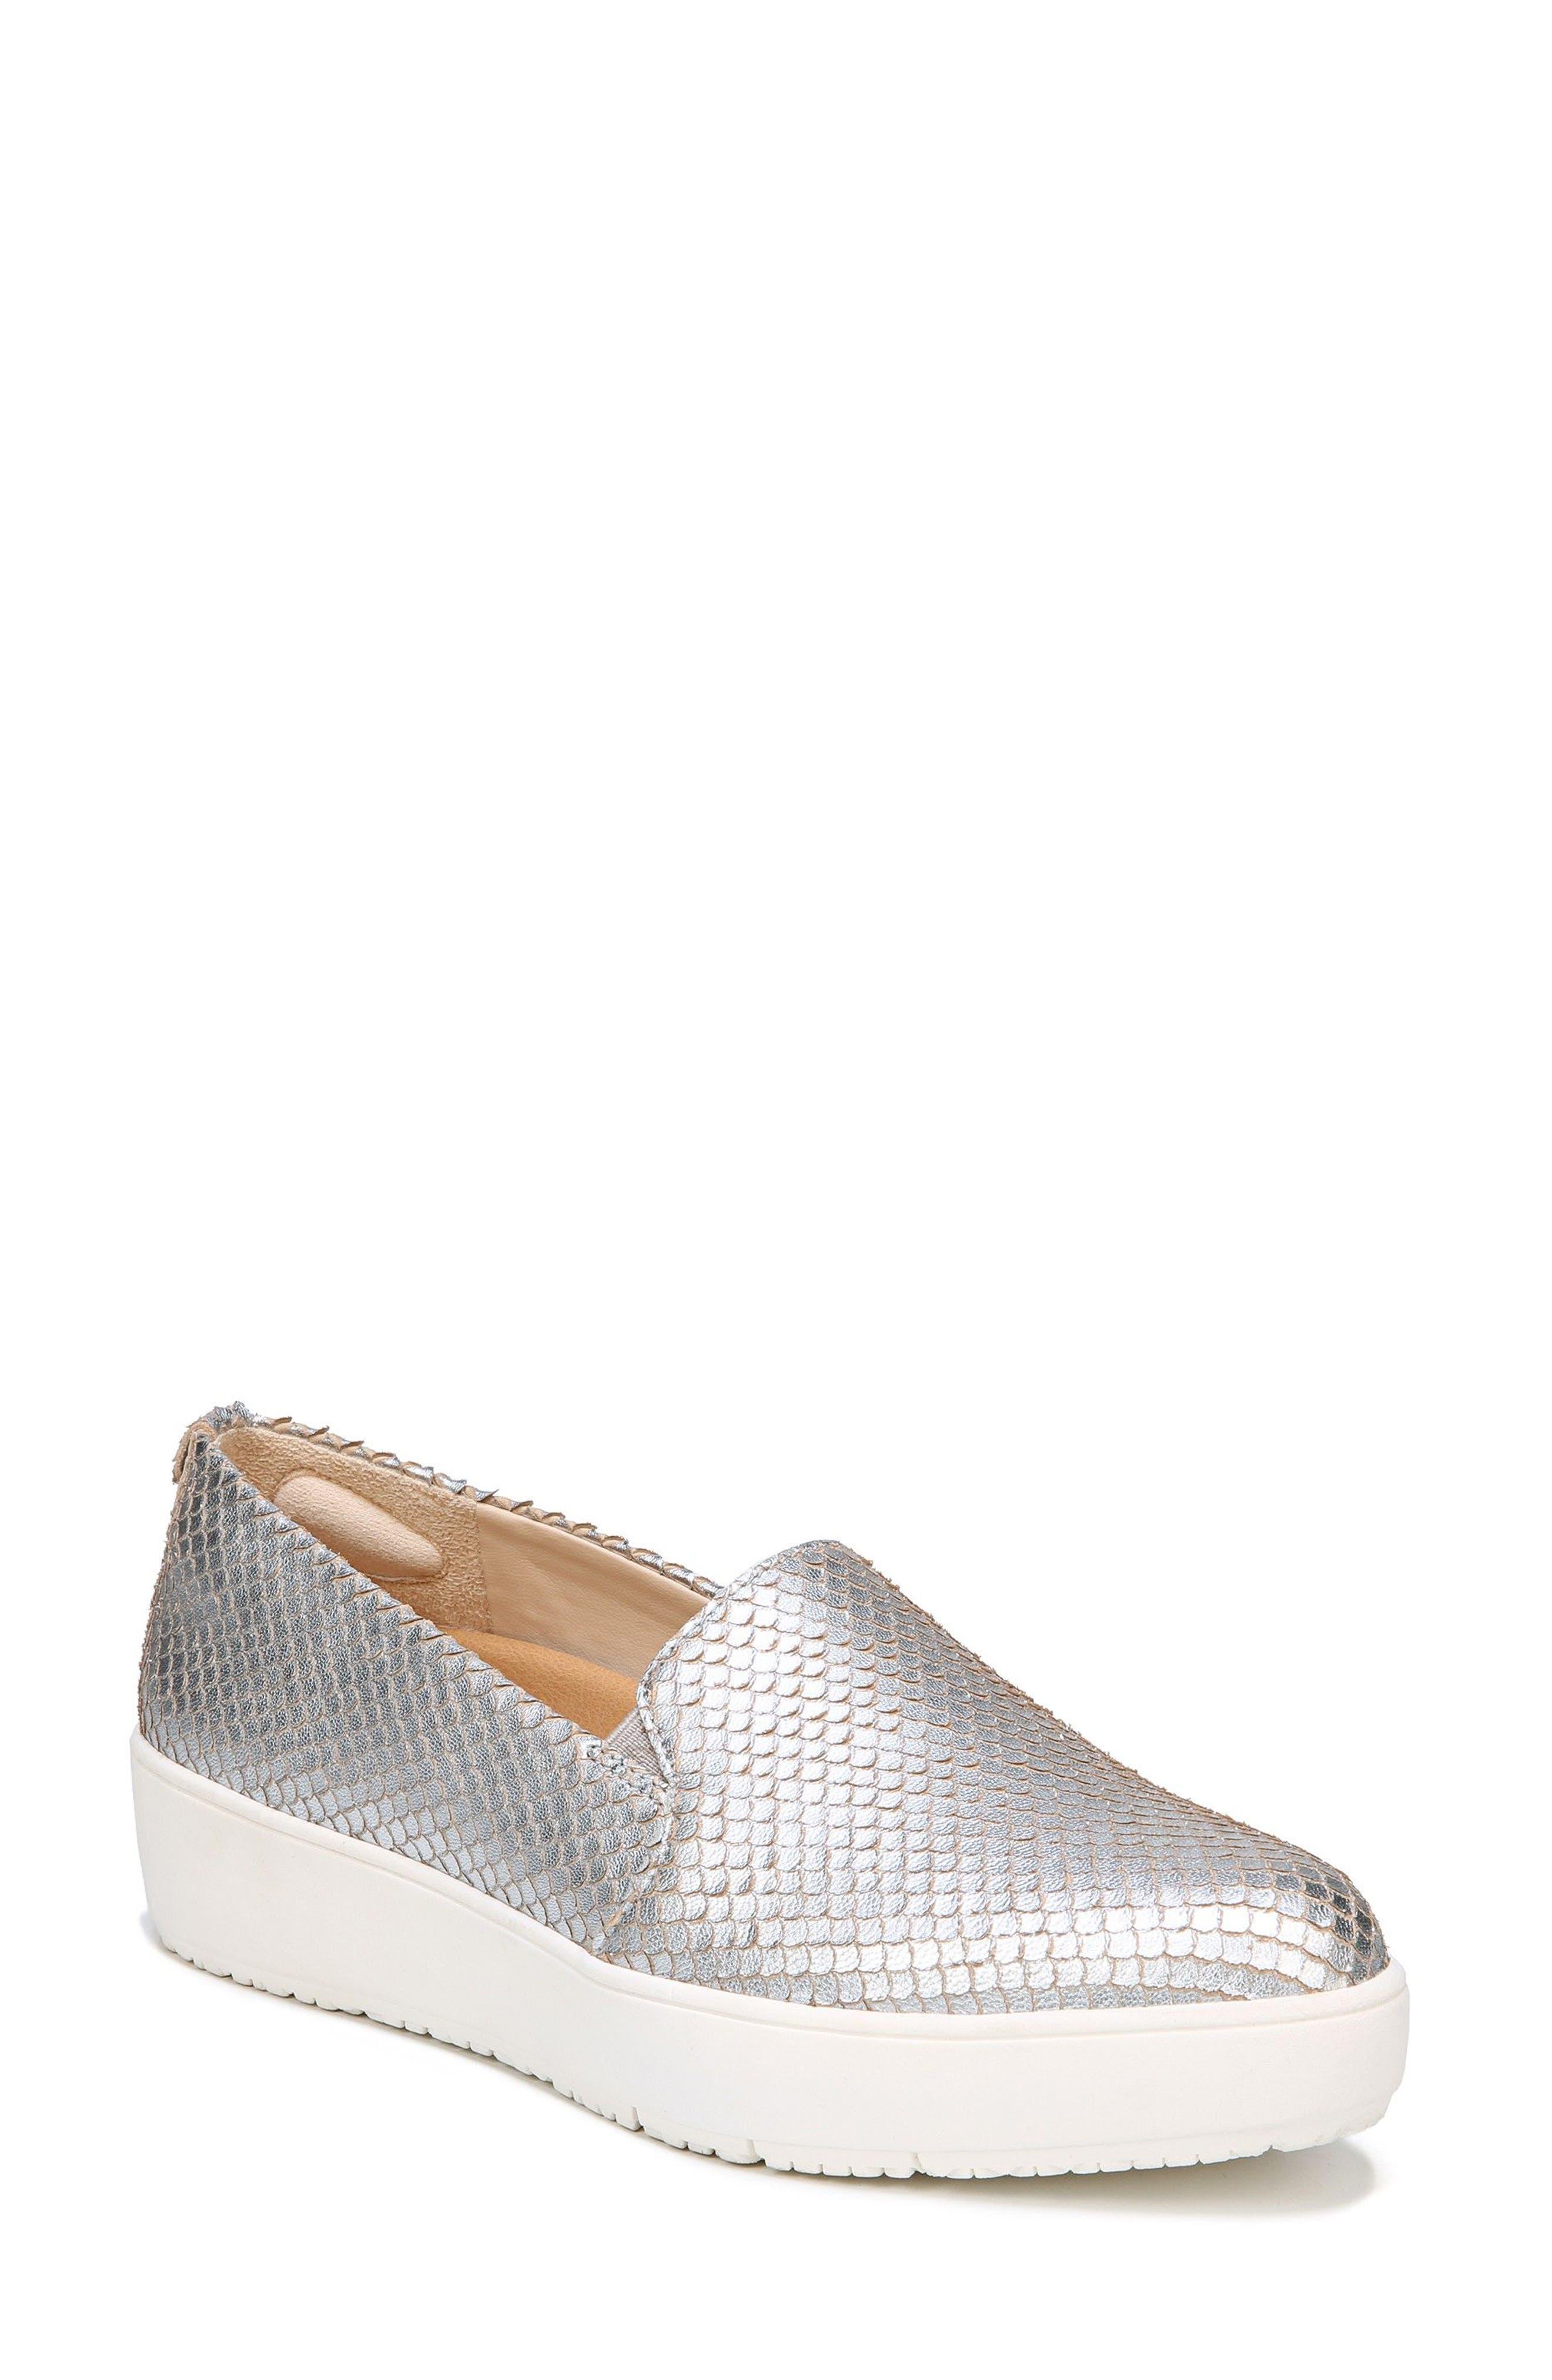 Bradyn Slip-On Sneaker,                             Main thumbnail 1, color,                             Silver Leather